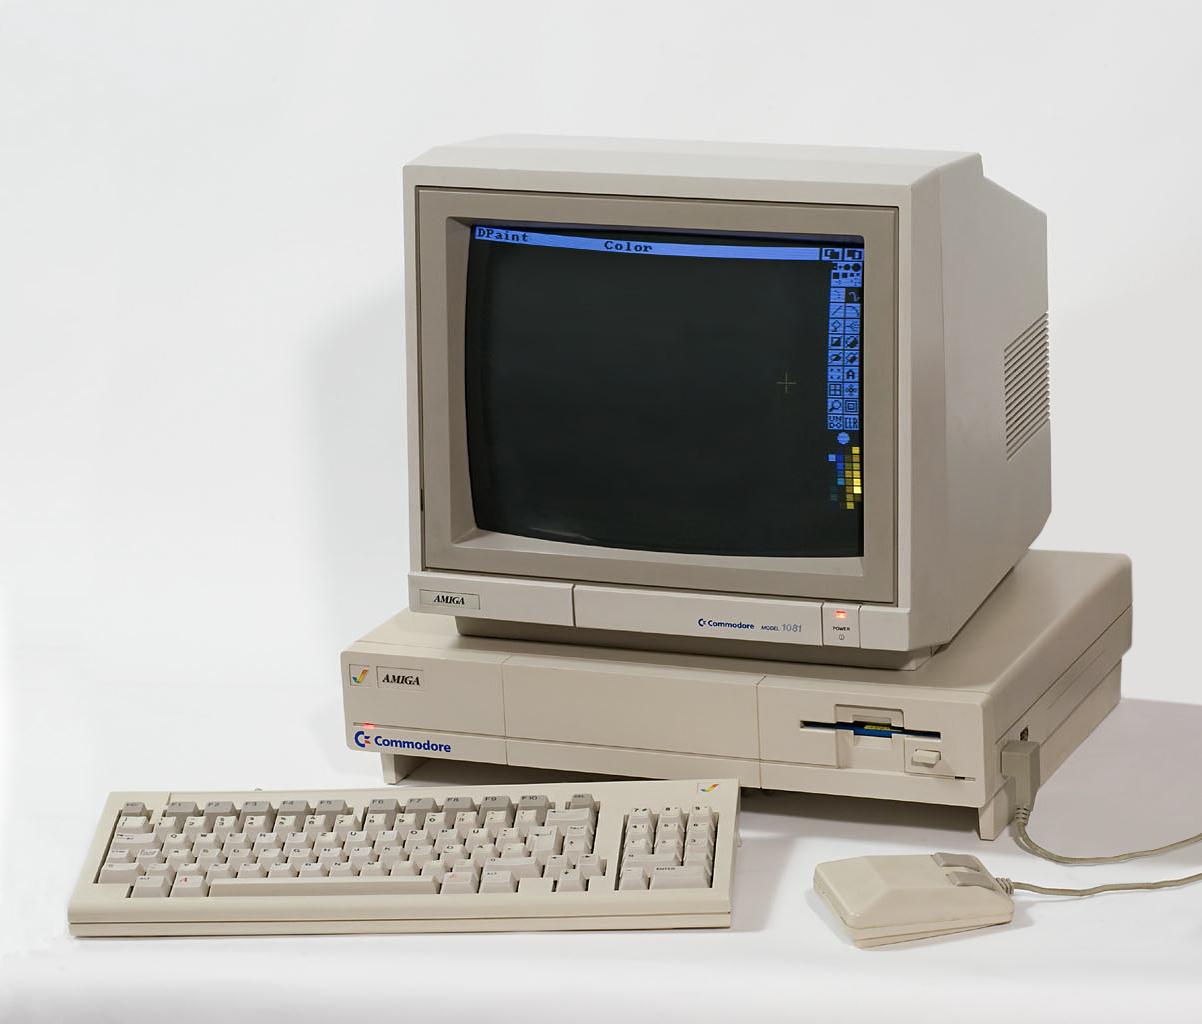 Amiga 1000 image